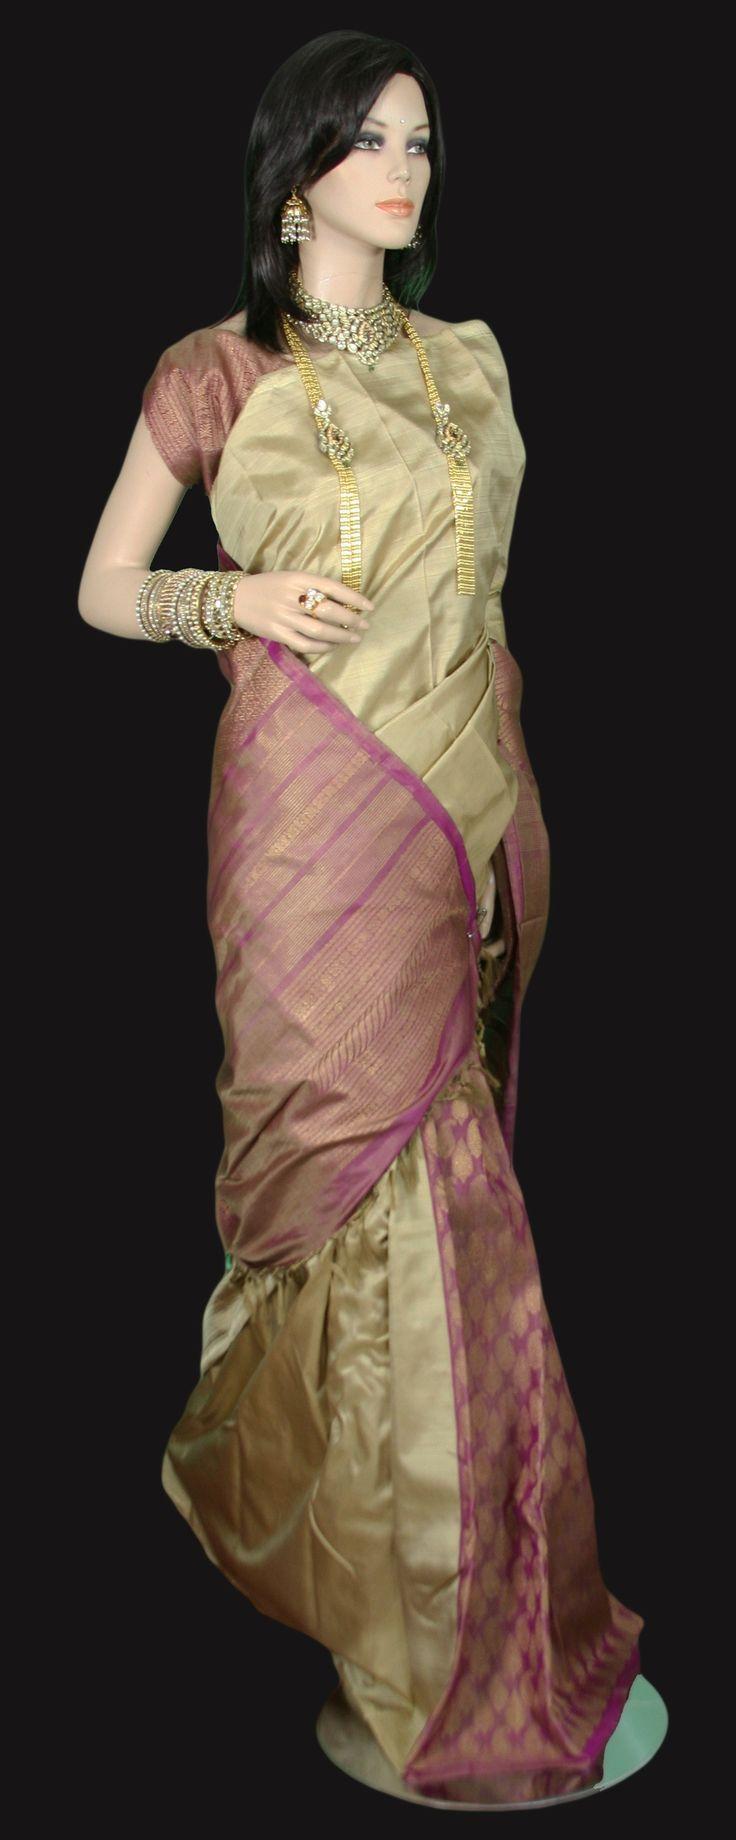 Beige Patli Pallu Zari Gold Kanjeevaram Saree